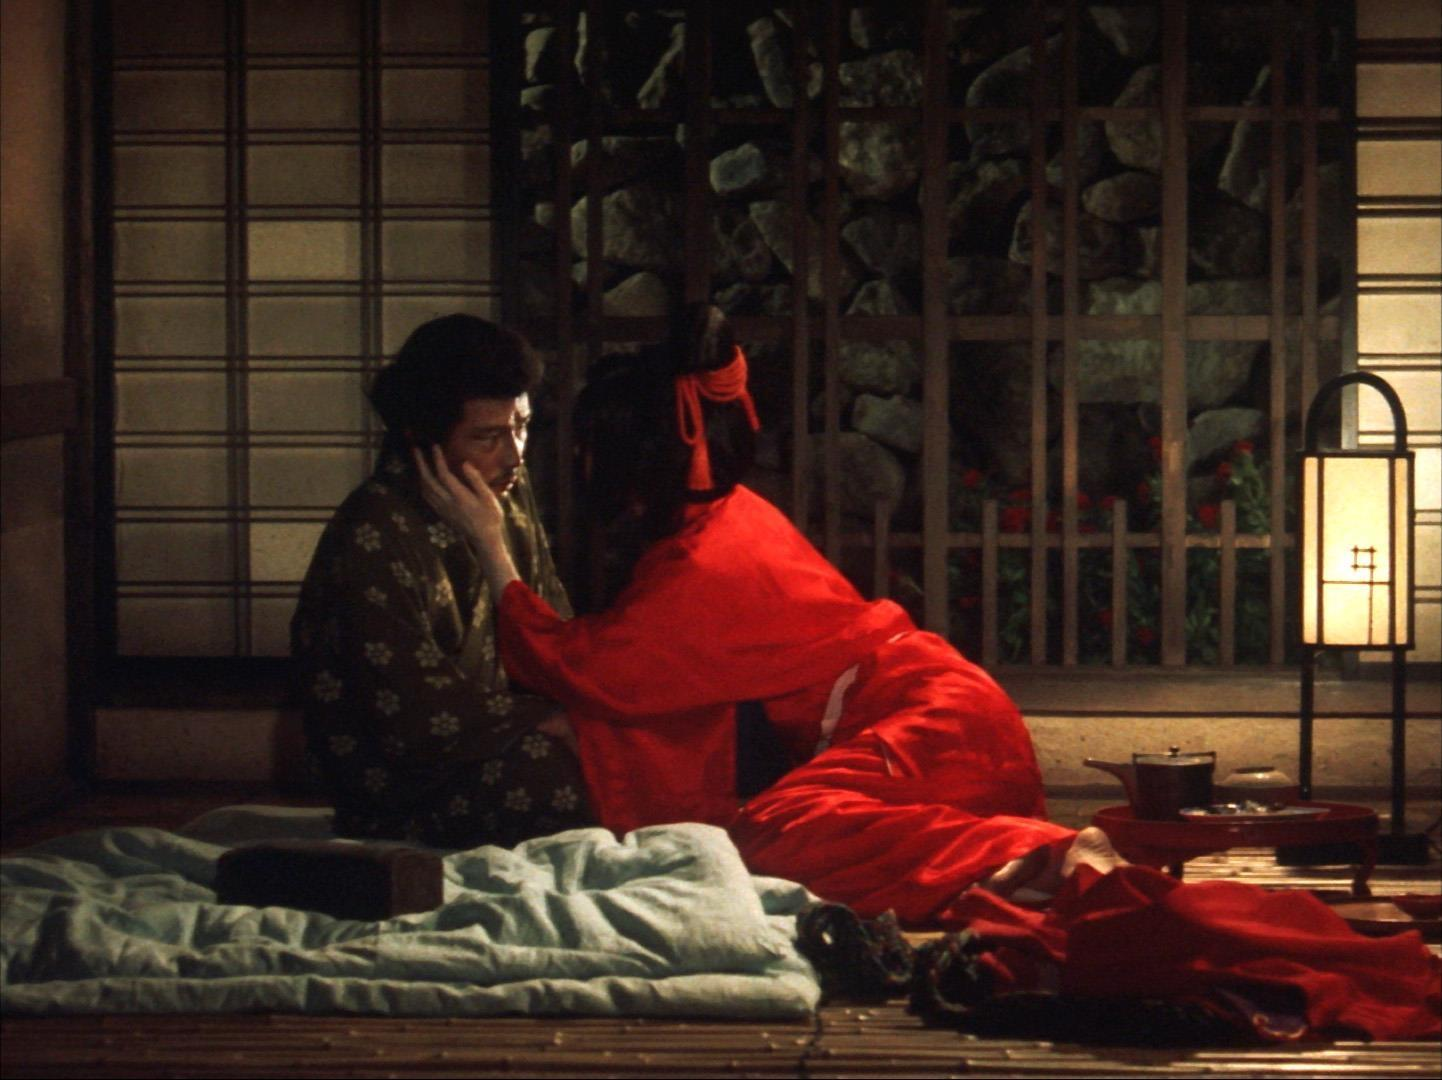 Silence de Masashiro Shinoda : ApoSTASI